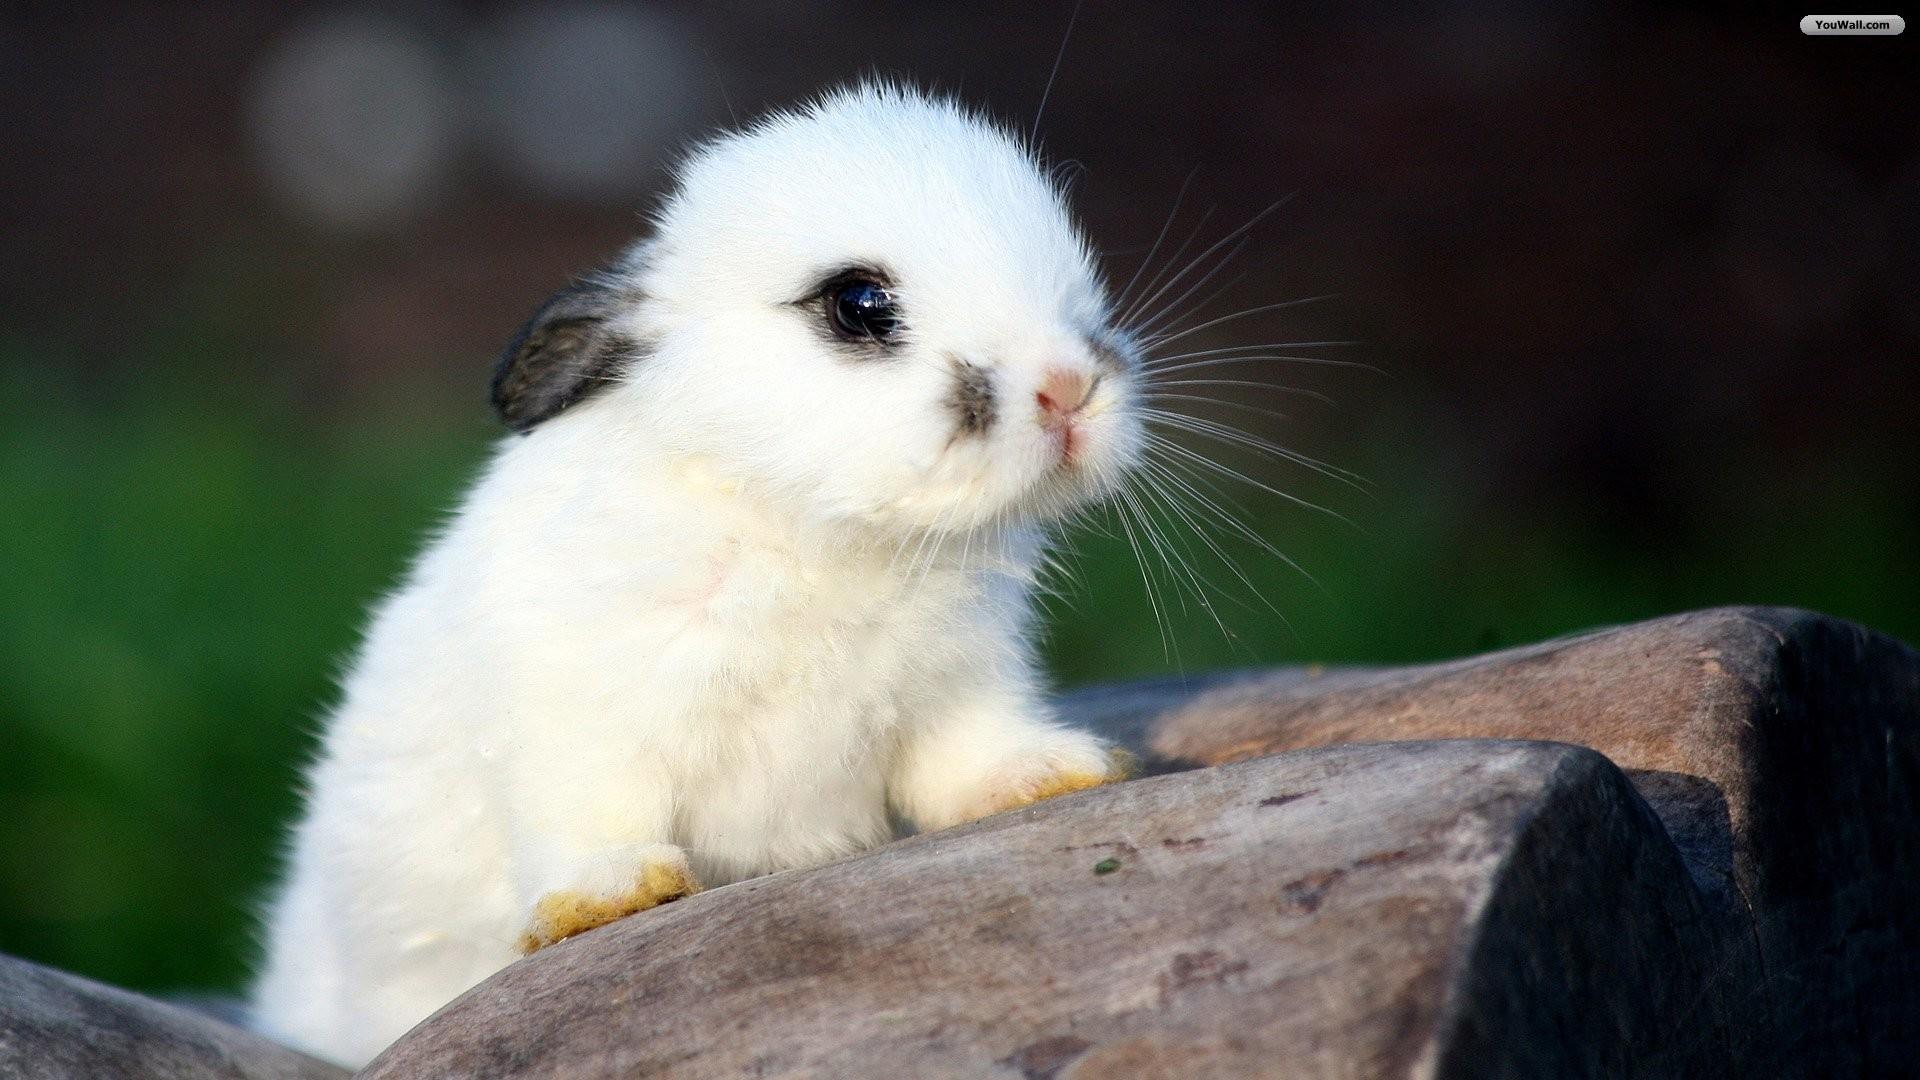 Little Cute Baby Girl Wallpaper Baby Bunny Wallpaper 183 ① Wallpapertag